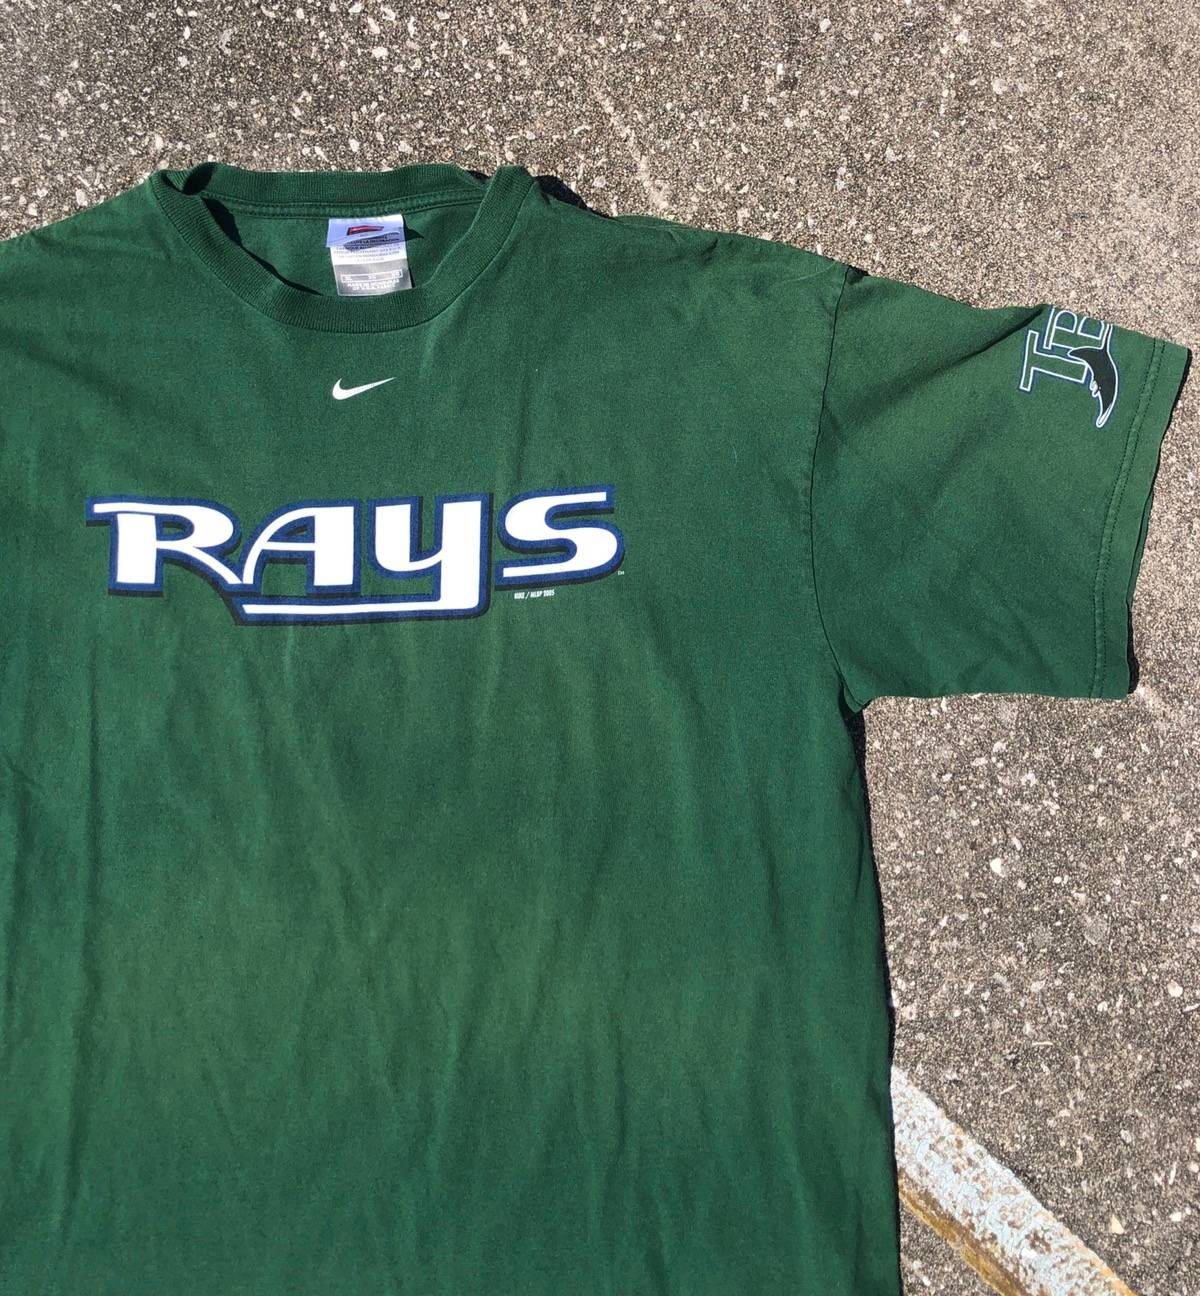 online store d6baa edd91 Mlb × Nike × Vintage Nike Tampa Bay Rays Mens Tee Shirt Xl Green Baseball  2005 Size Xl $27